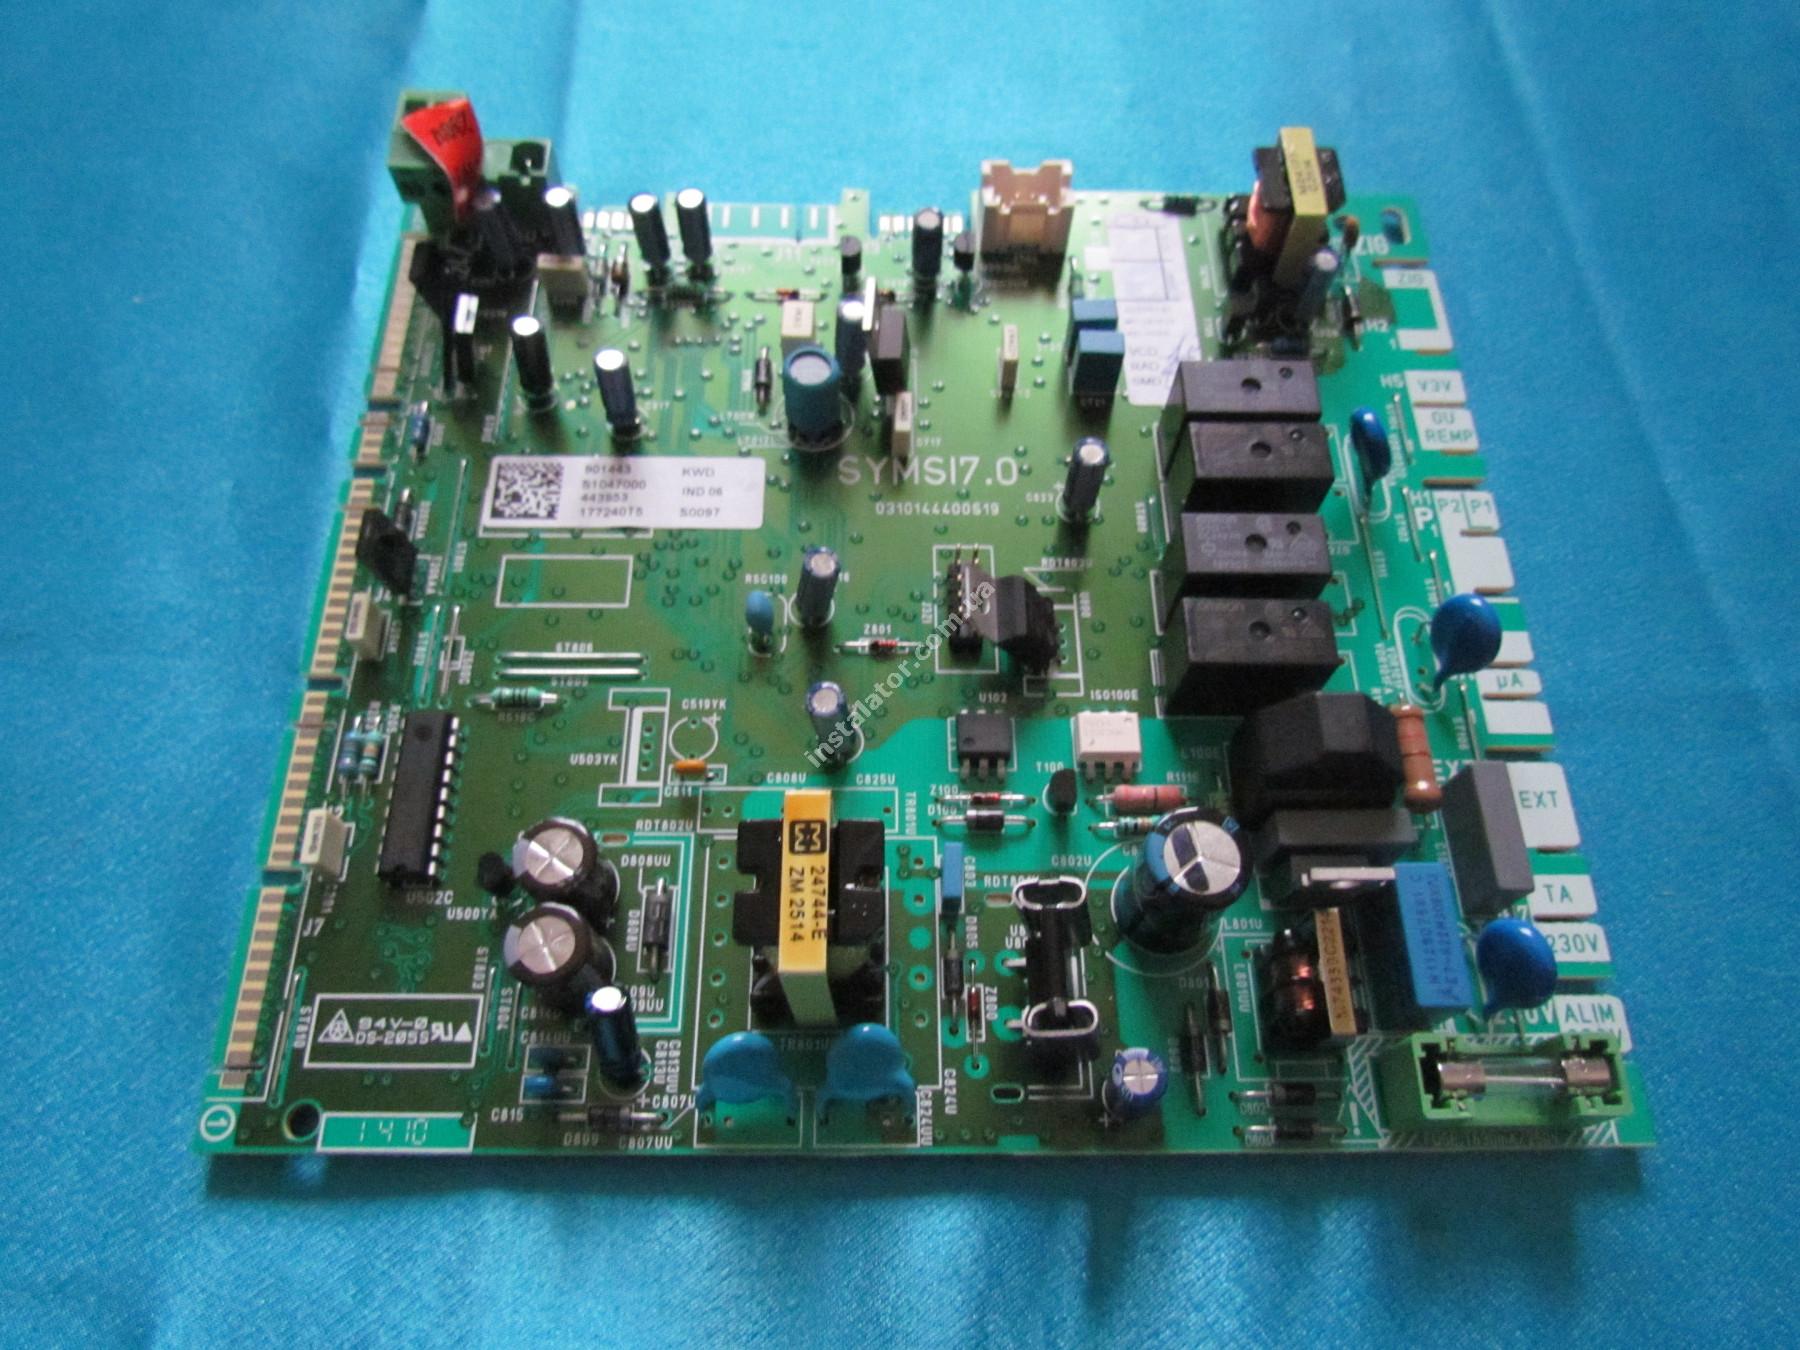 S1047000 Плата керування (основна) Saunier Duval ThemaClassic, Isofast, Combitek full-image-2